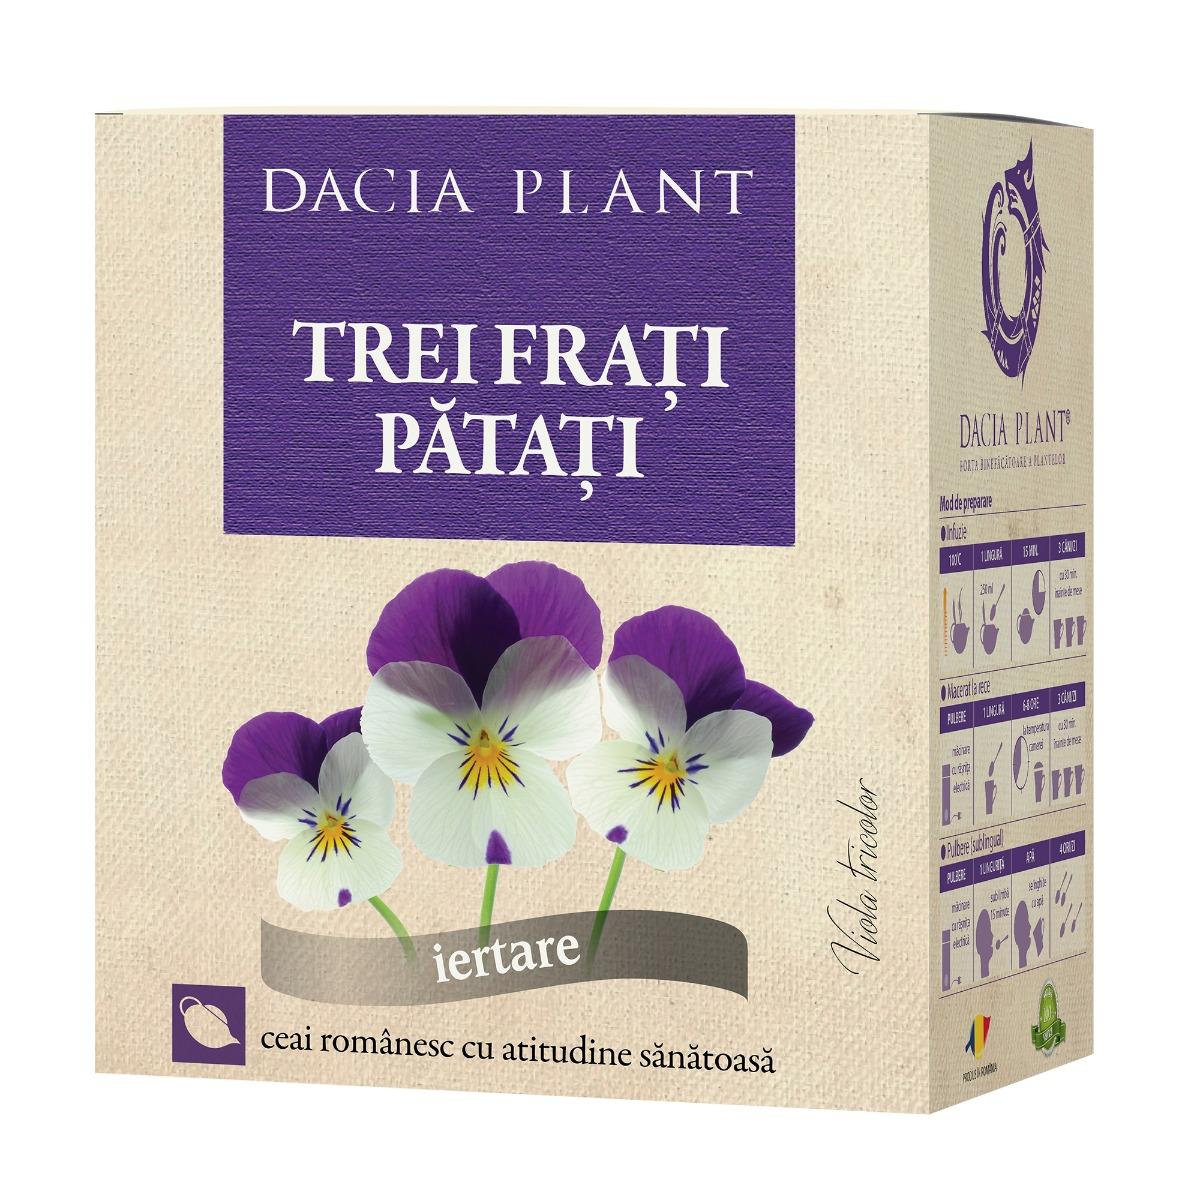 Ceai trei frati patati, 50g, Dacia Plant drmax.ro